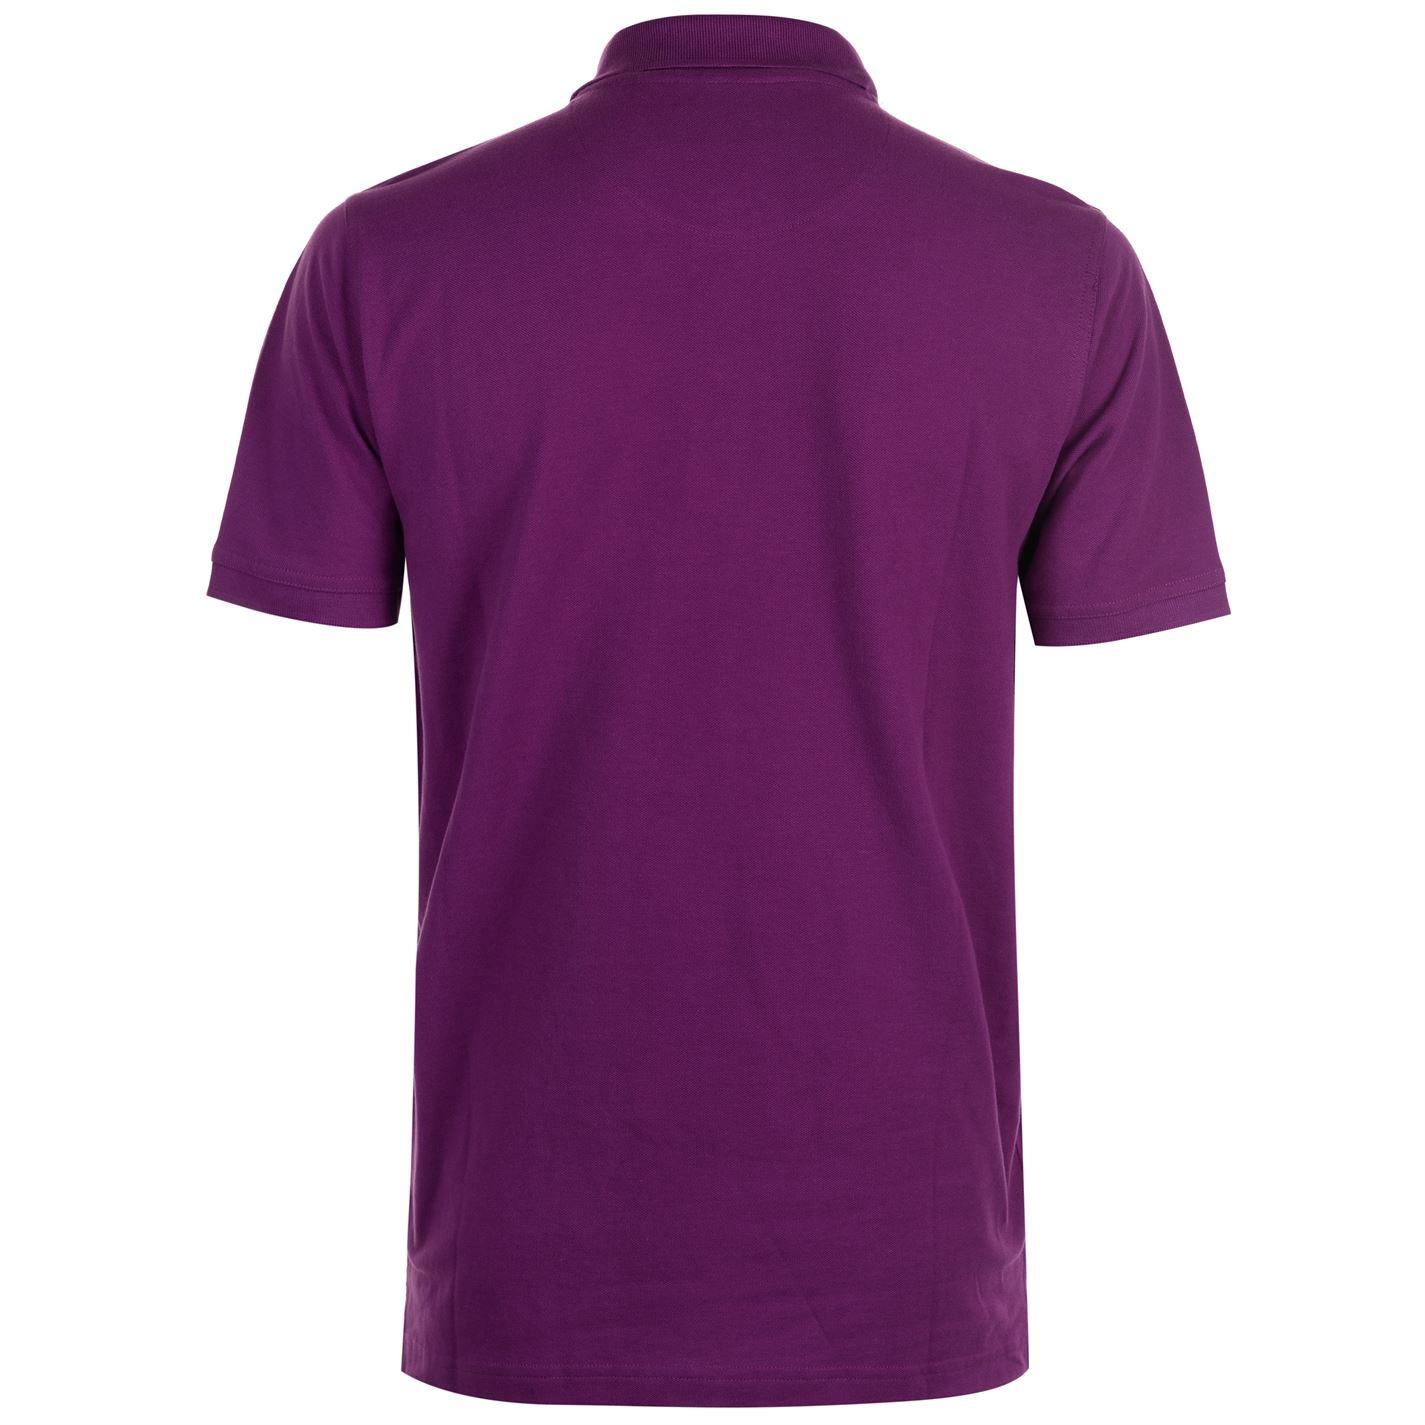 40c9349b Pierre Cardin Mens C Plain Polo T Shirt Short Sleeve Classic Fit Tee ...